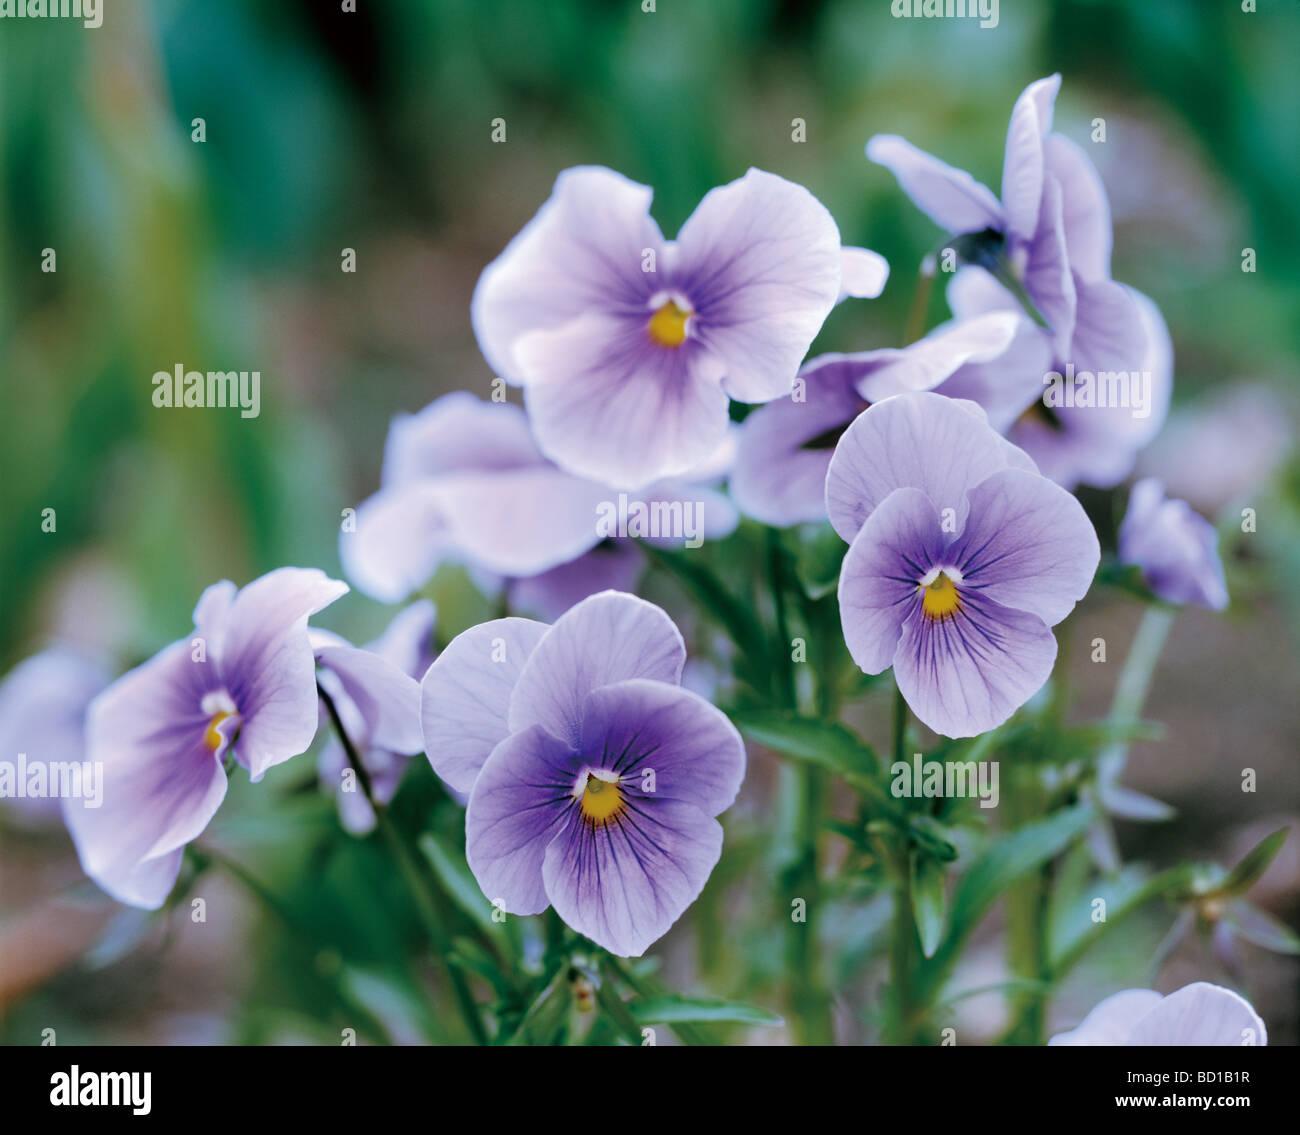 Violet Banque D'Images